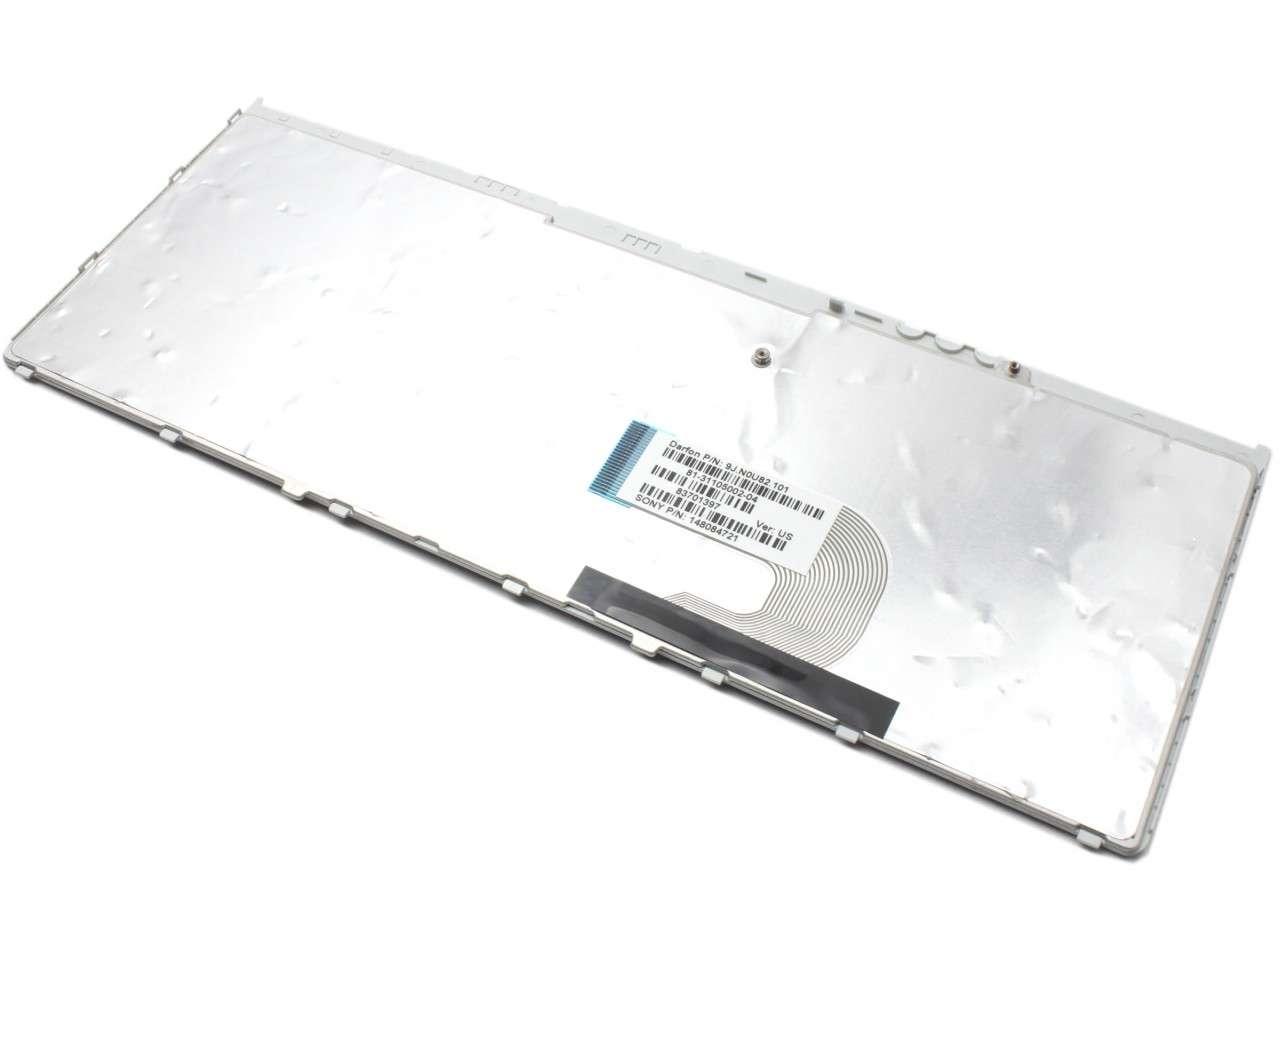 Tastatura Sony Vaio VGN-FW26T/B neagra cu rama gri imagine powerlaptop.ro 2021